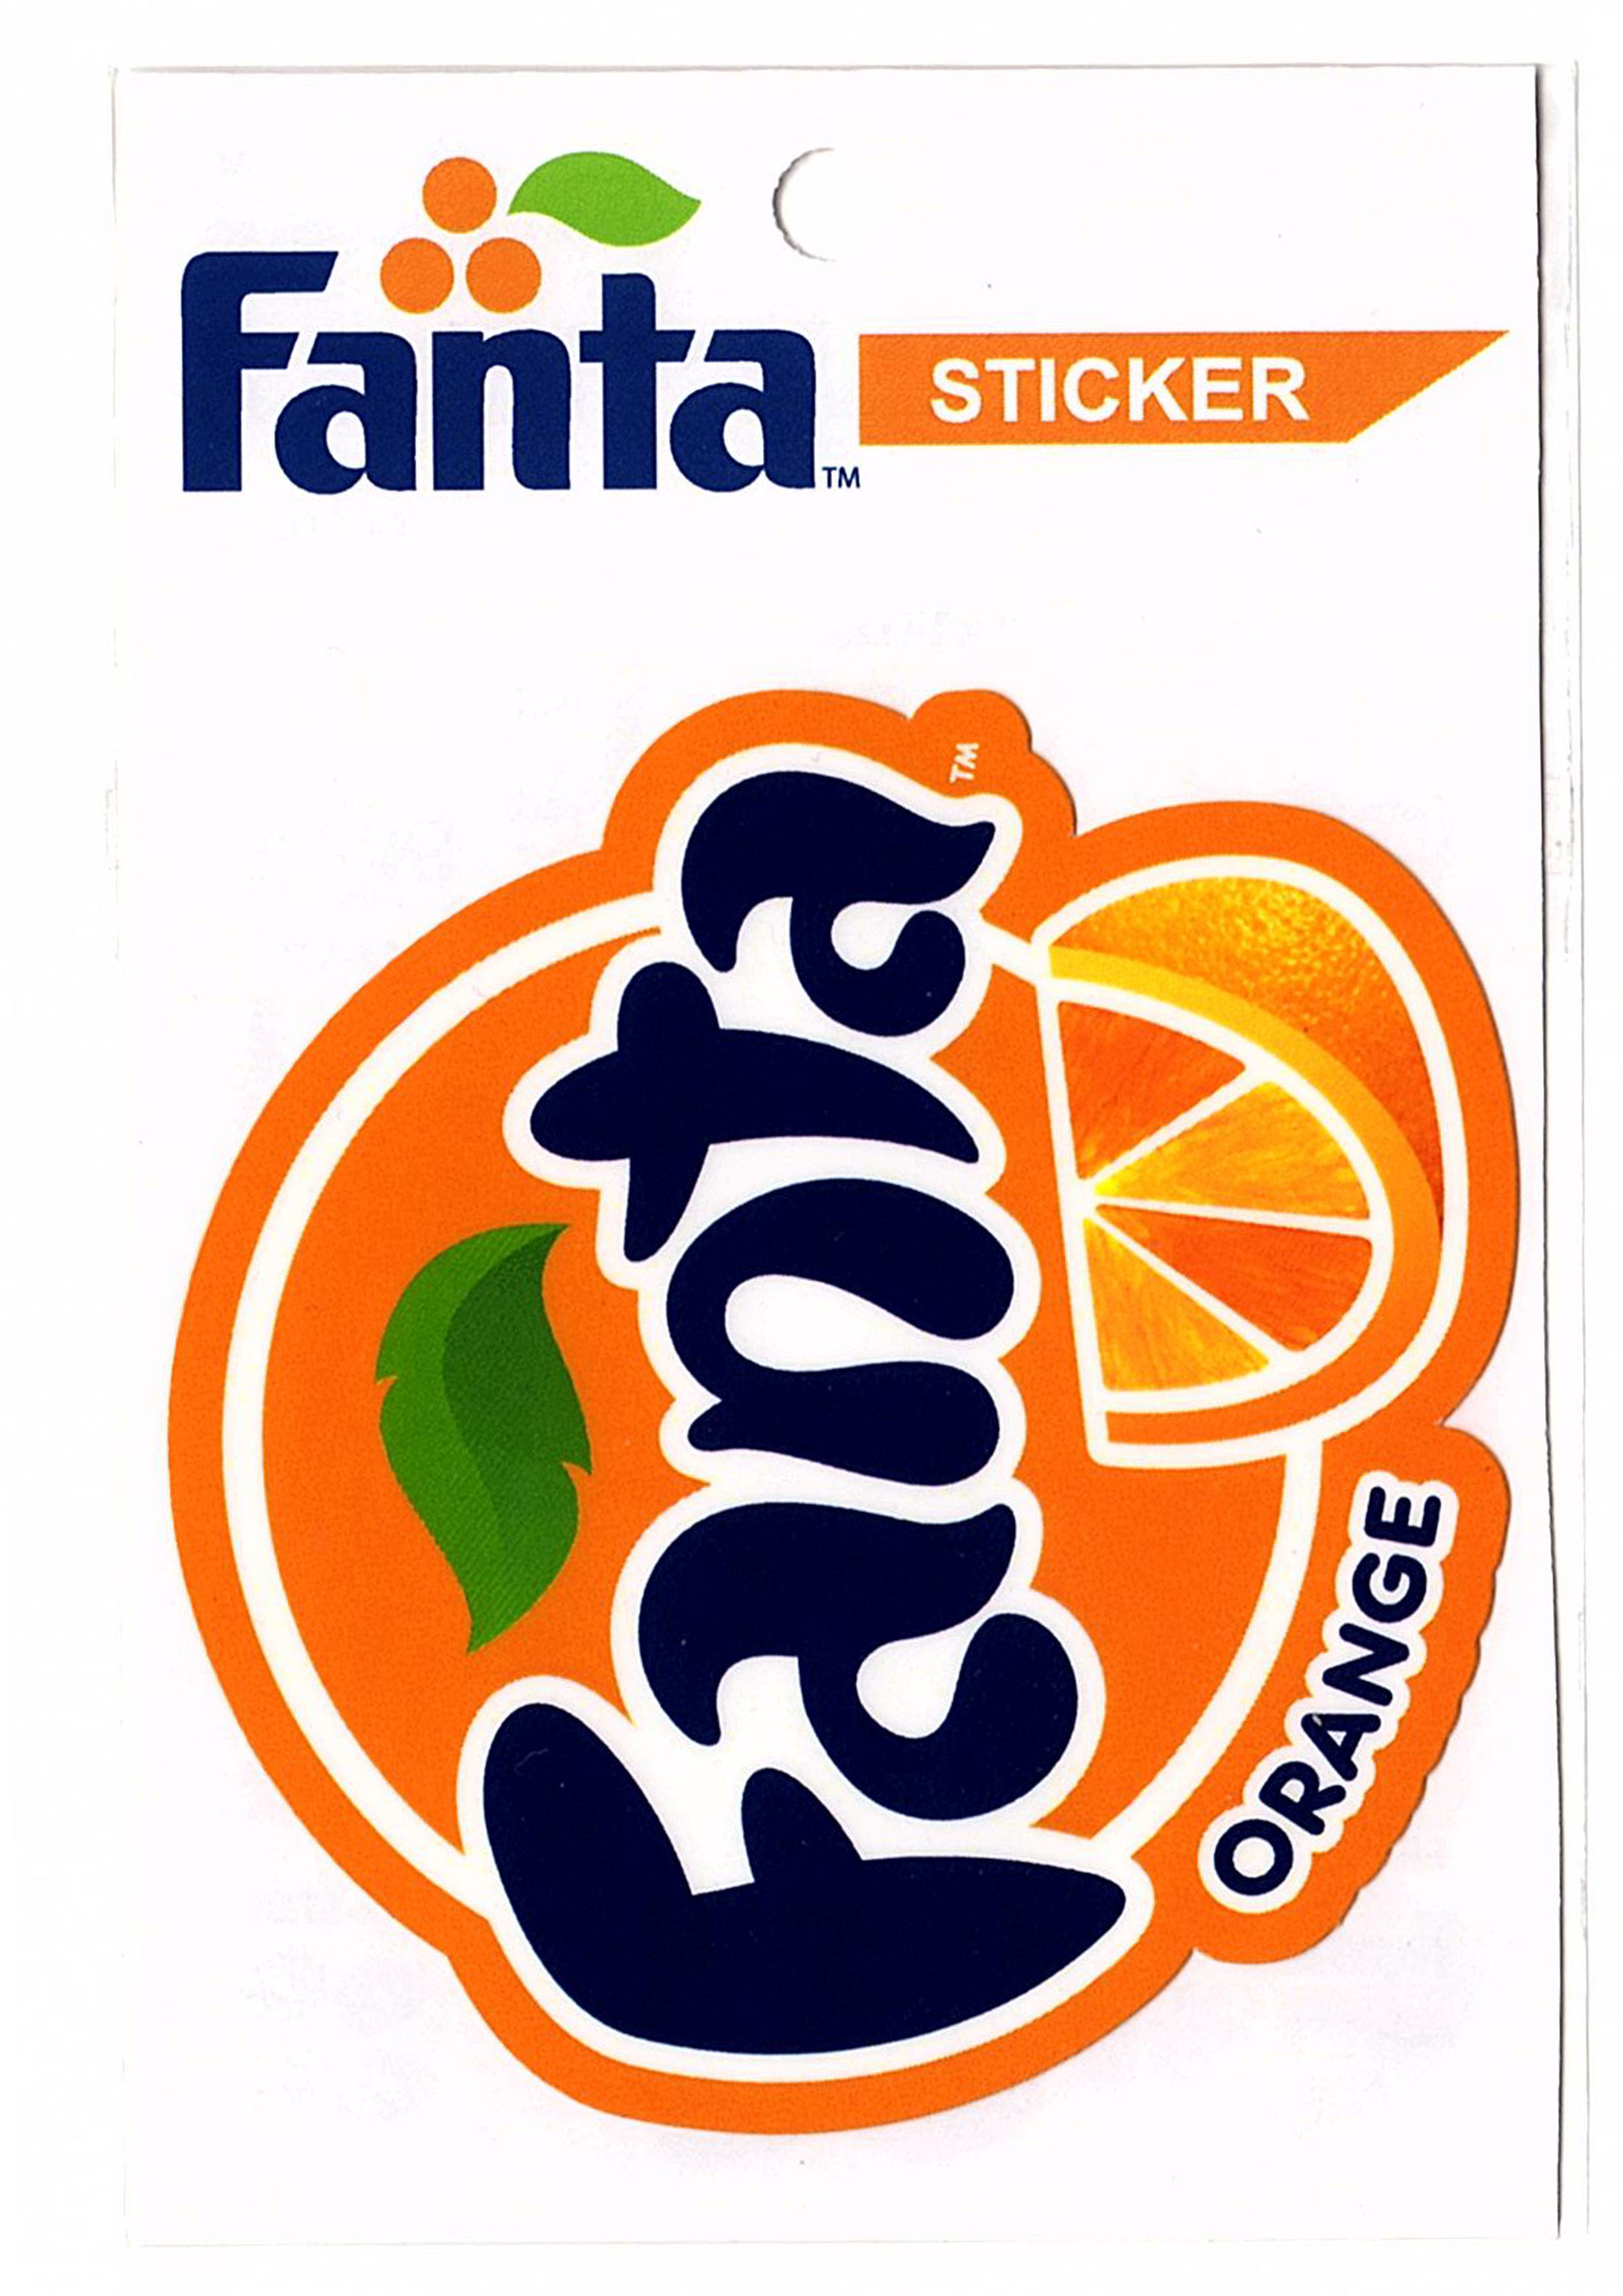 Fanta☆FA-ST28☆ファンタ☆Fanta Sticker ファンタステッカー ファンタオレンジ ファンタグレープ